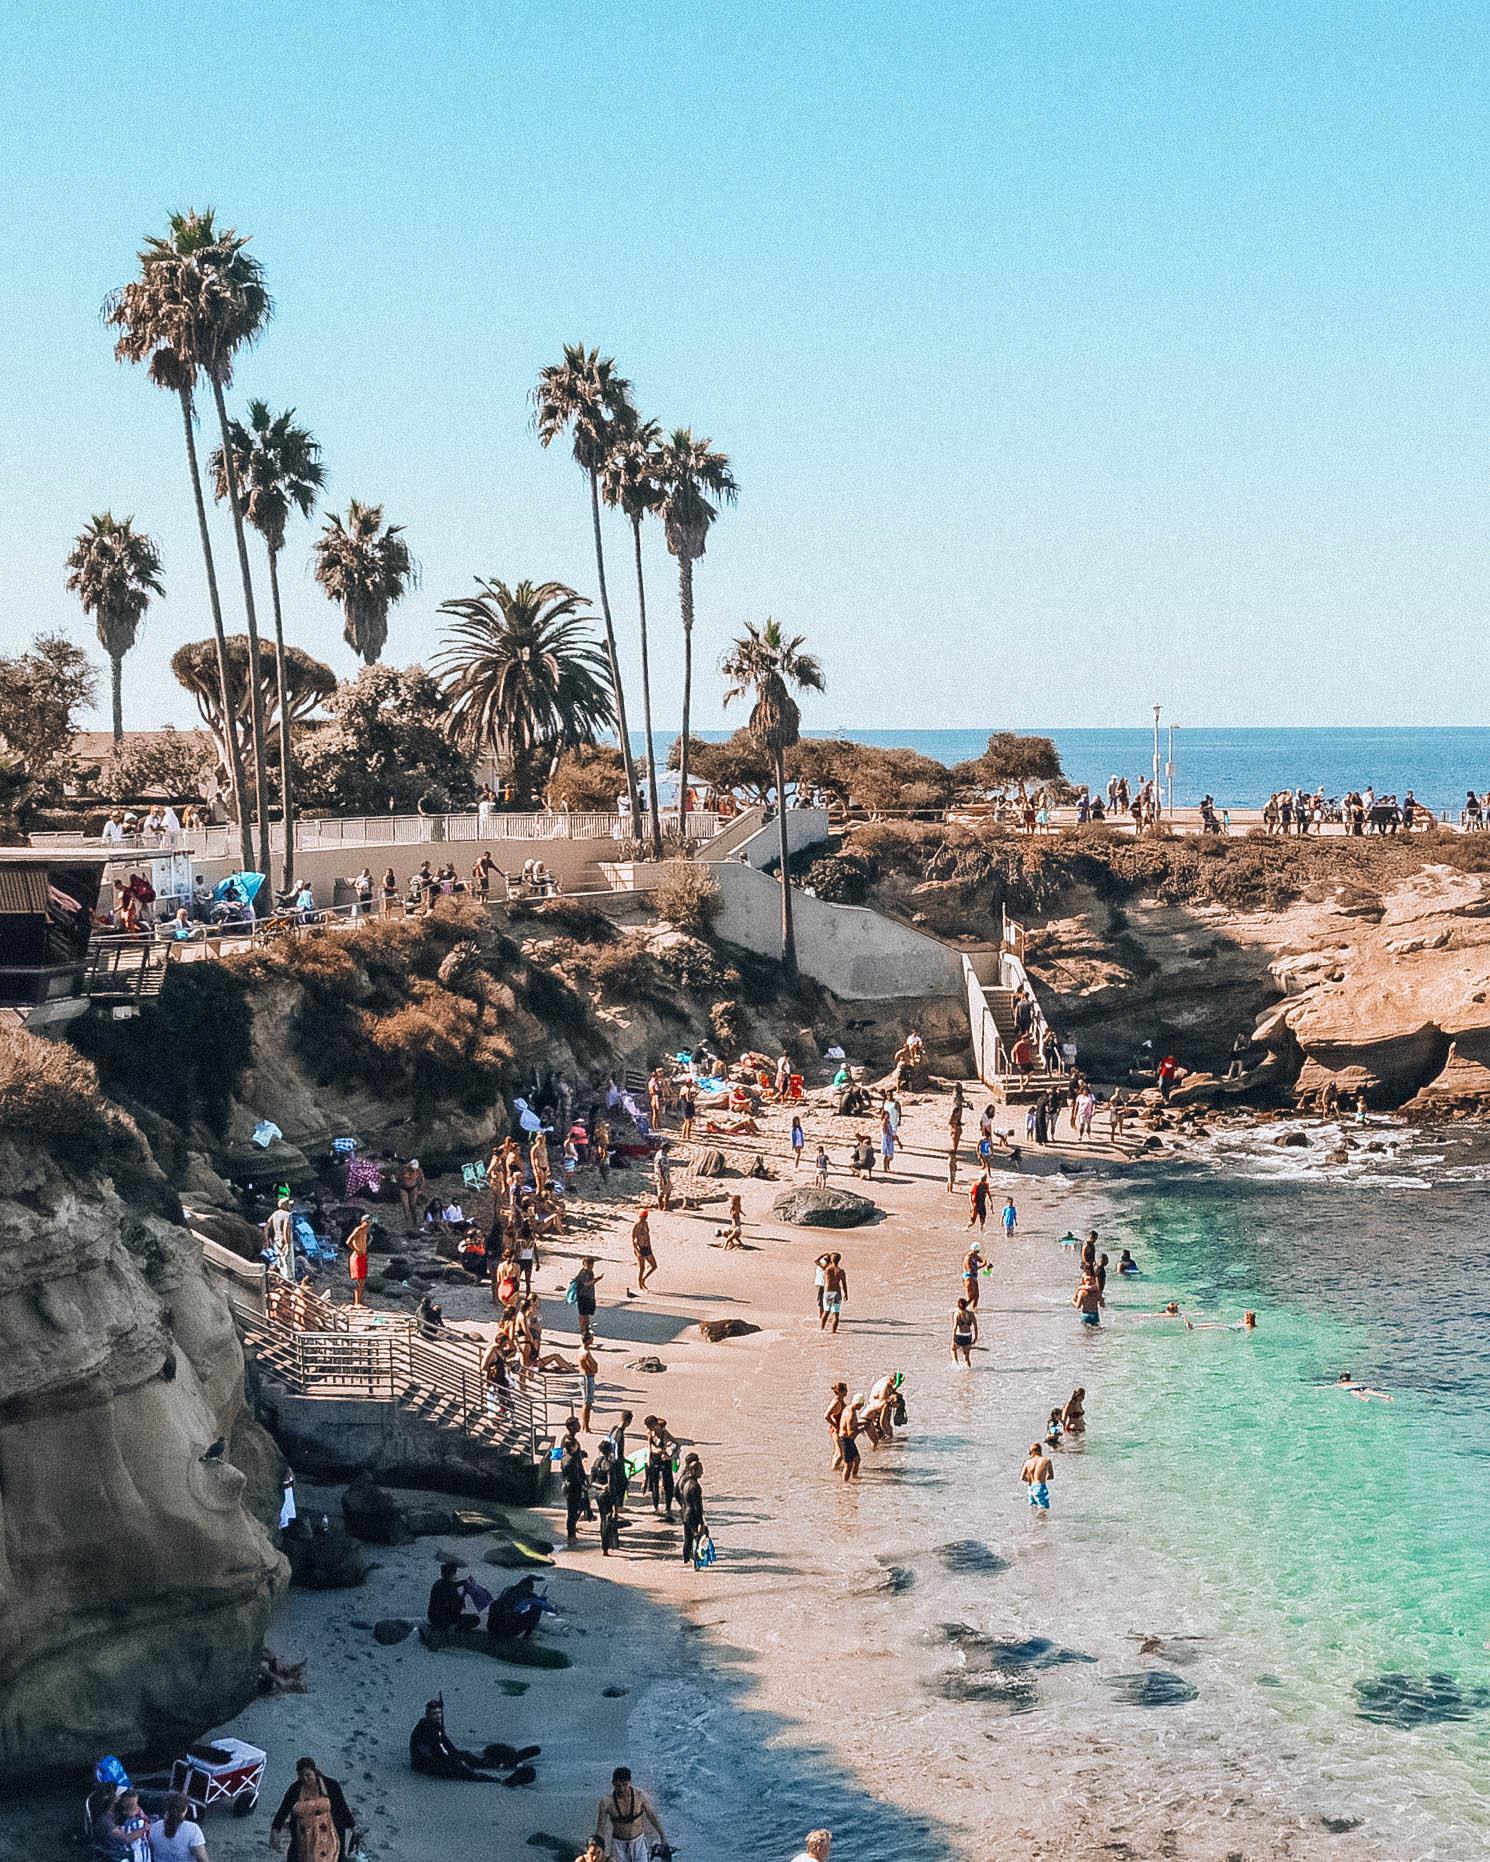 la-jolla-california-goseekexplore.com